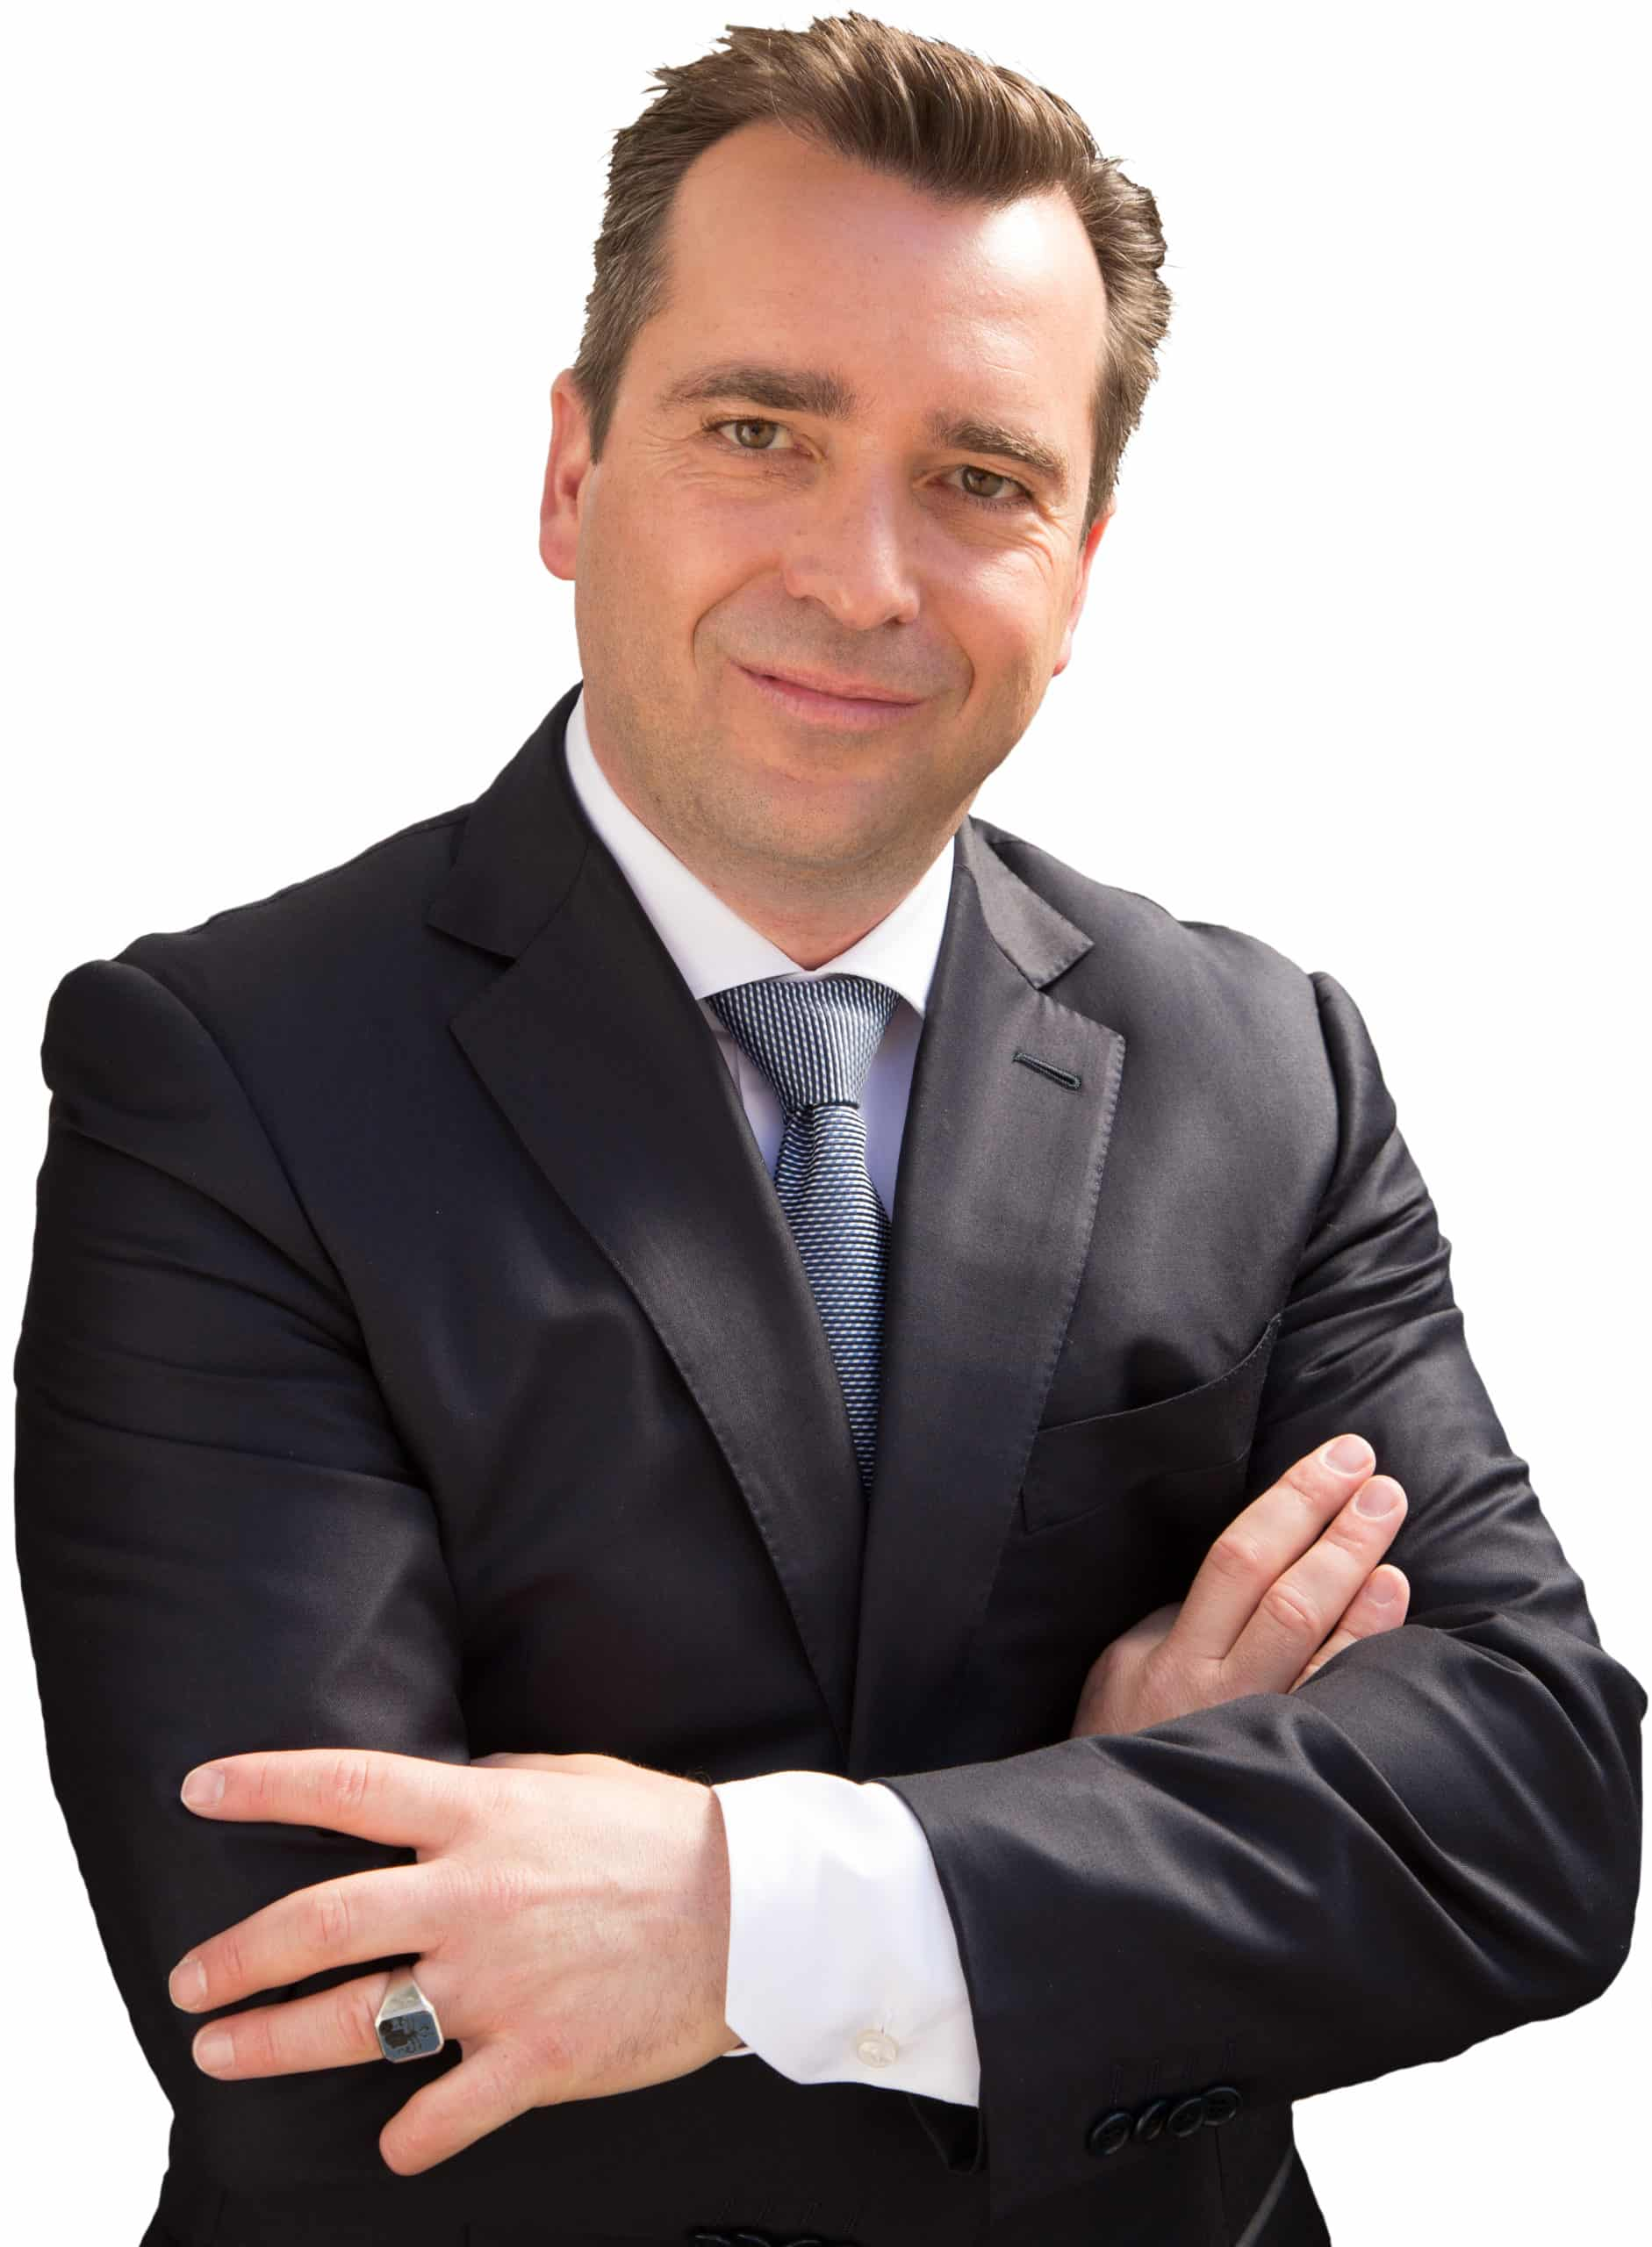 Falk Raudies